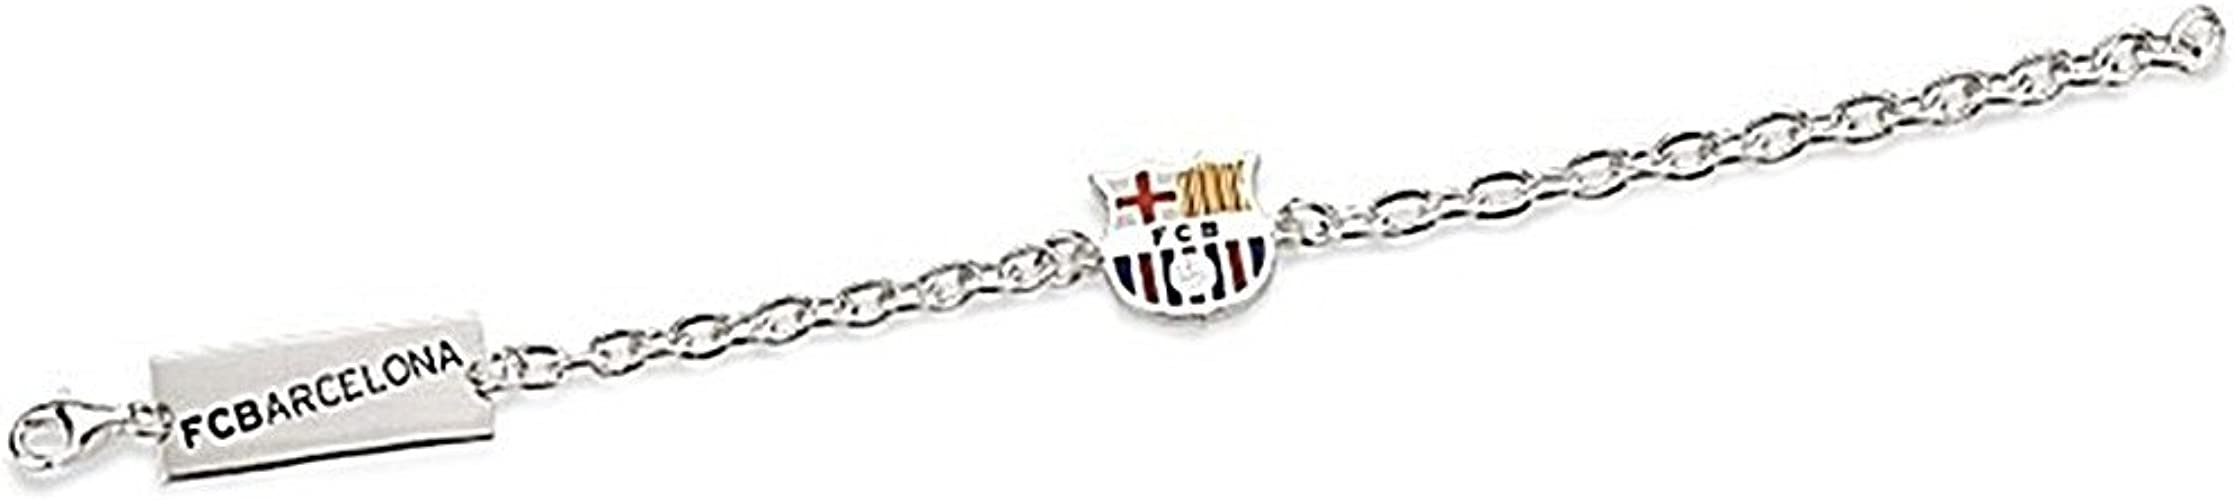 Pulsera escudo F.C. Barcelona Plata de ley chapa [6920] - Modelo: 10-062: Amazon.es: Joyería